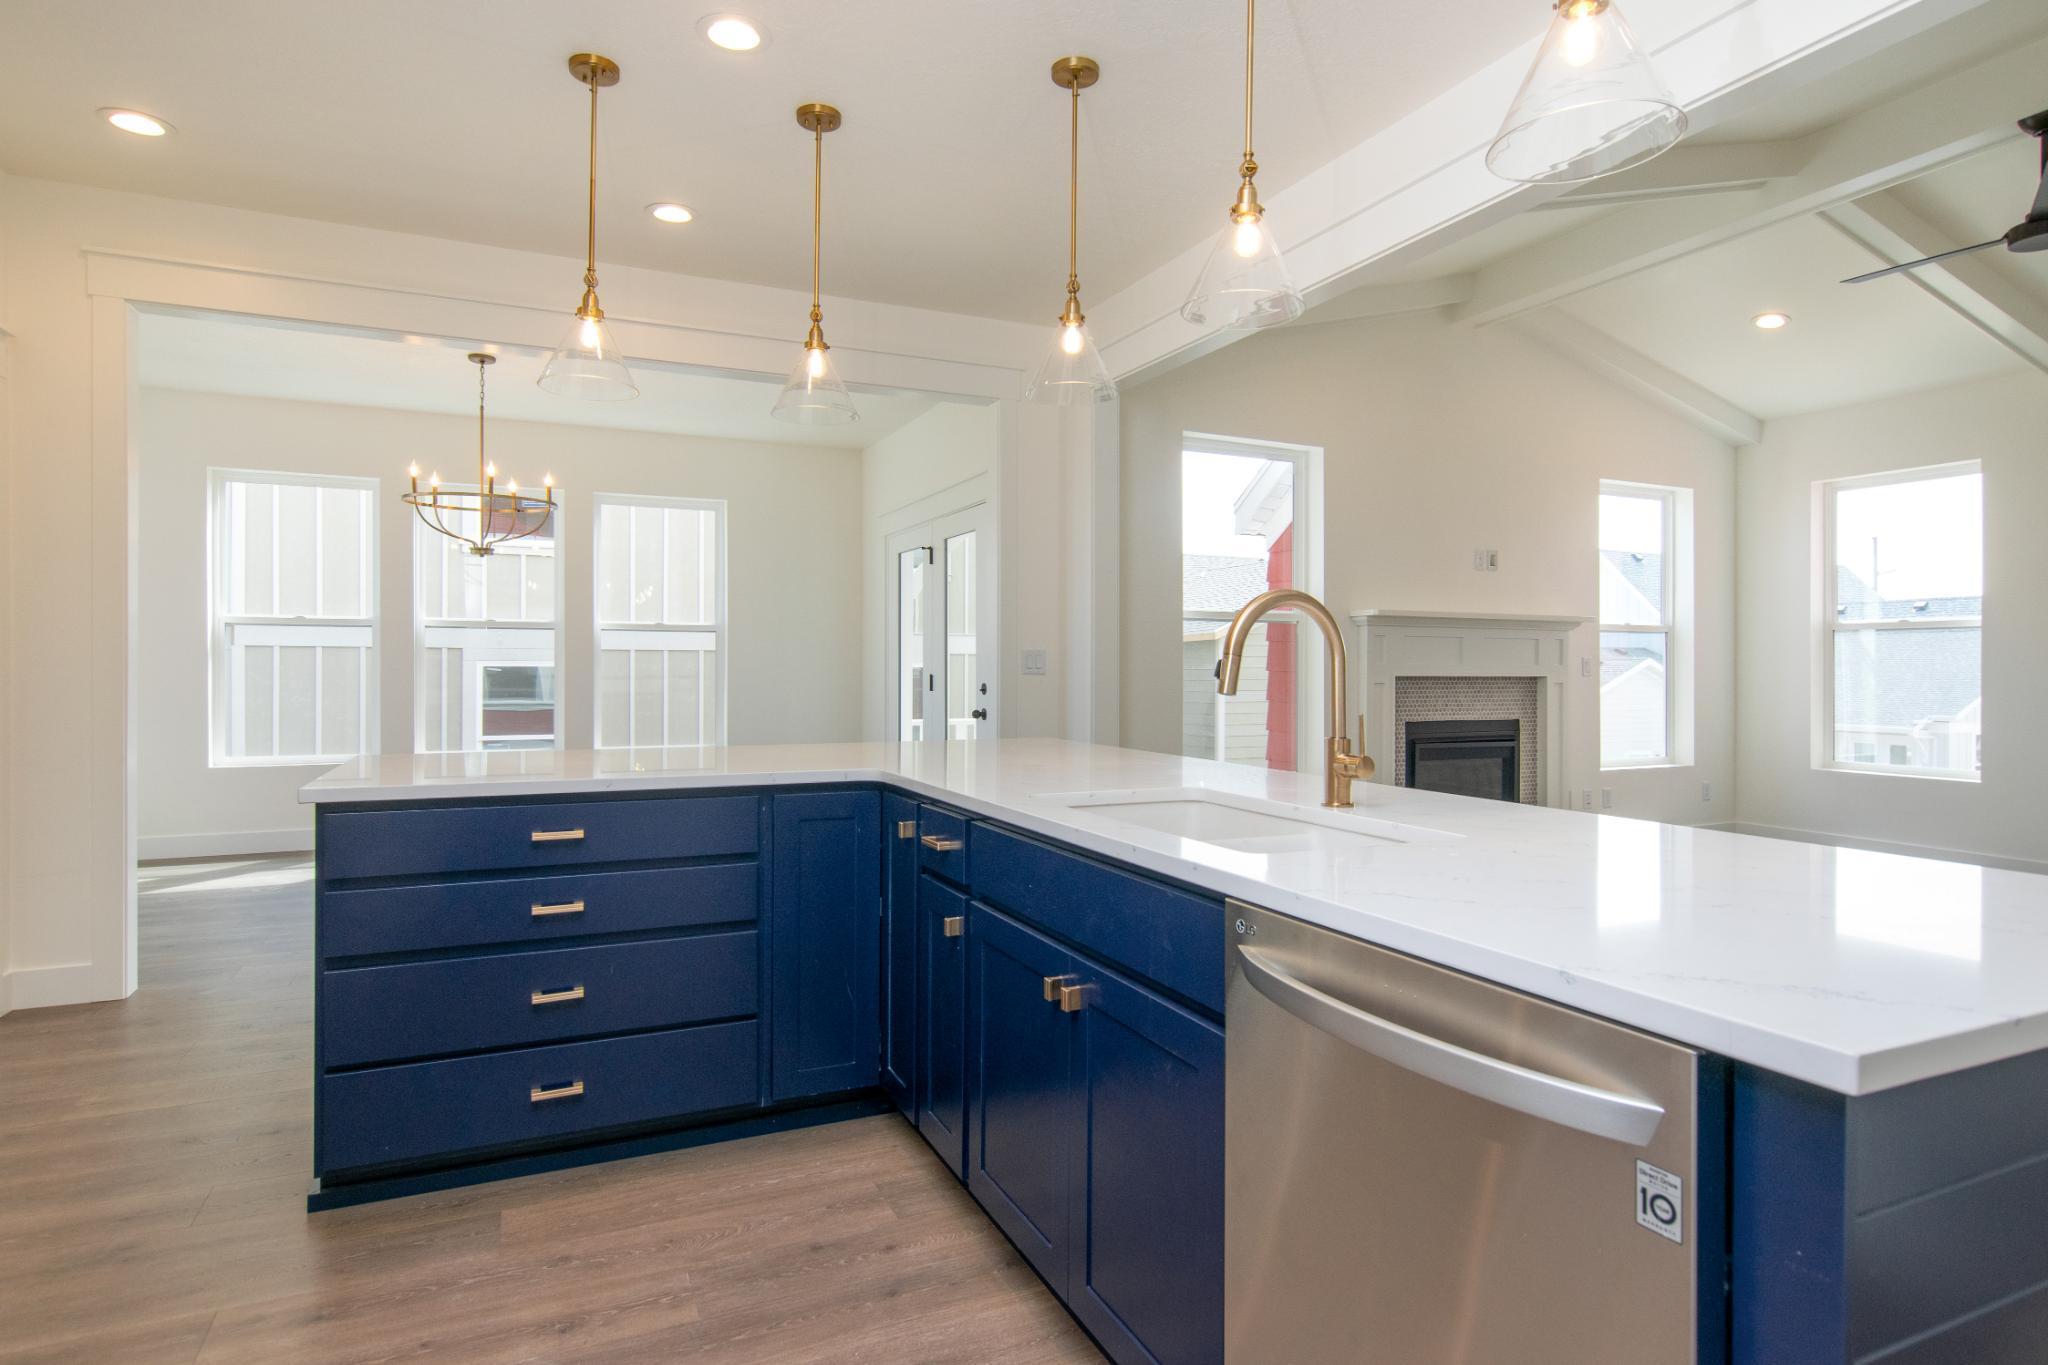 Kitchen featured in the Evergreen By Destination Homes in Salt Lake City-Ogden, UT